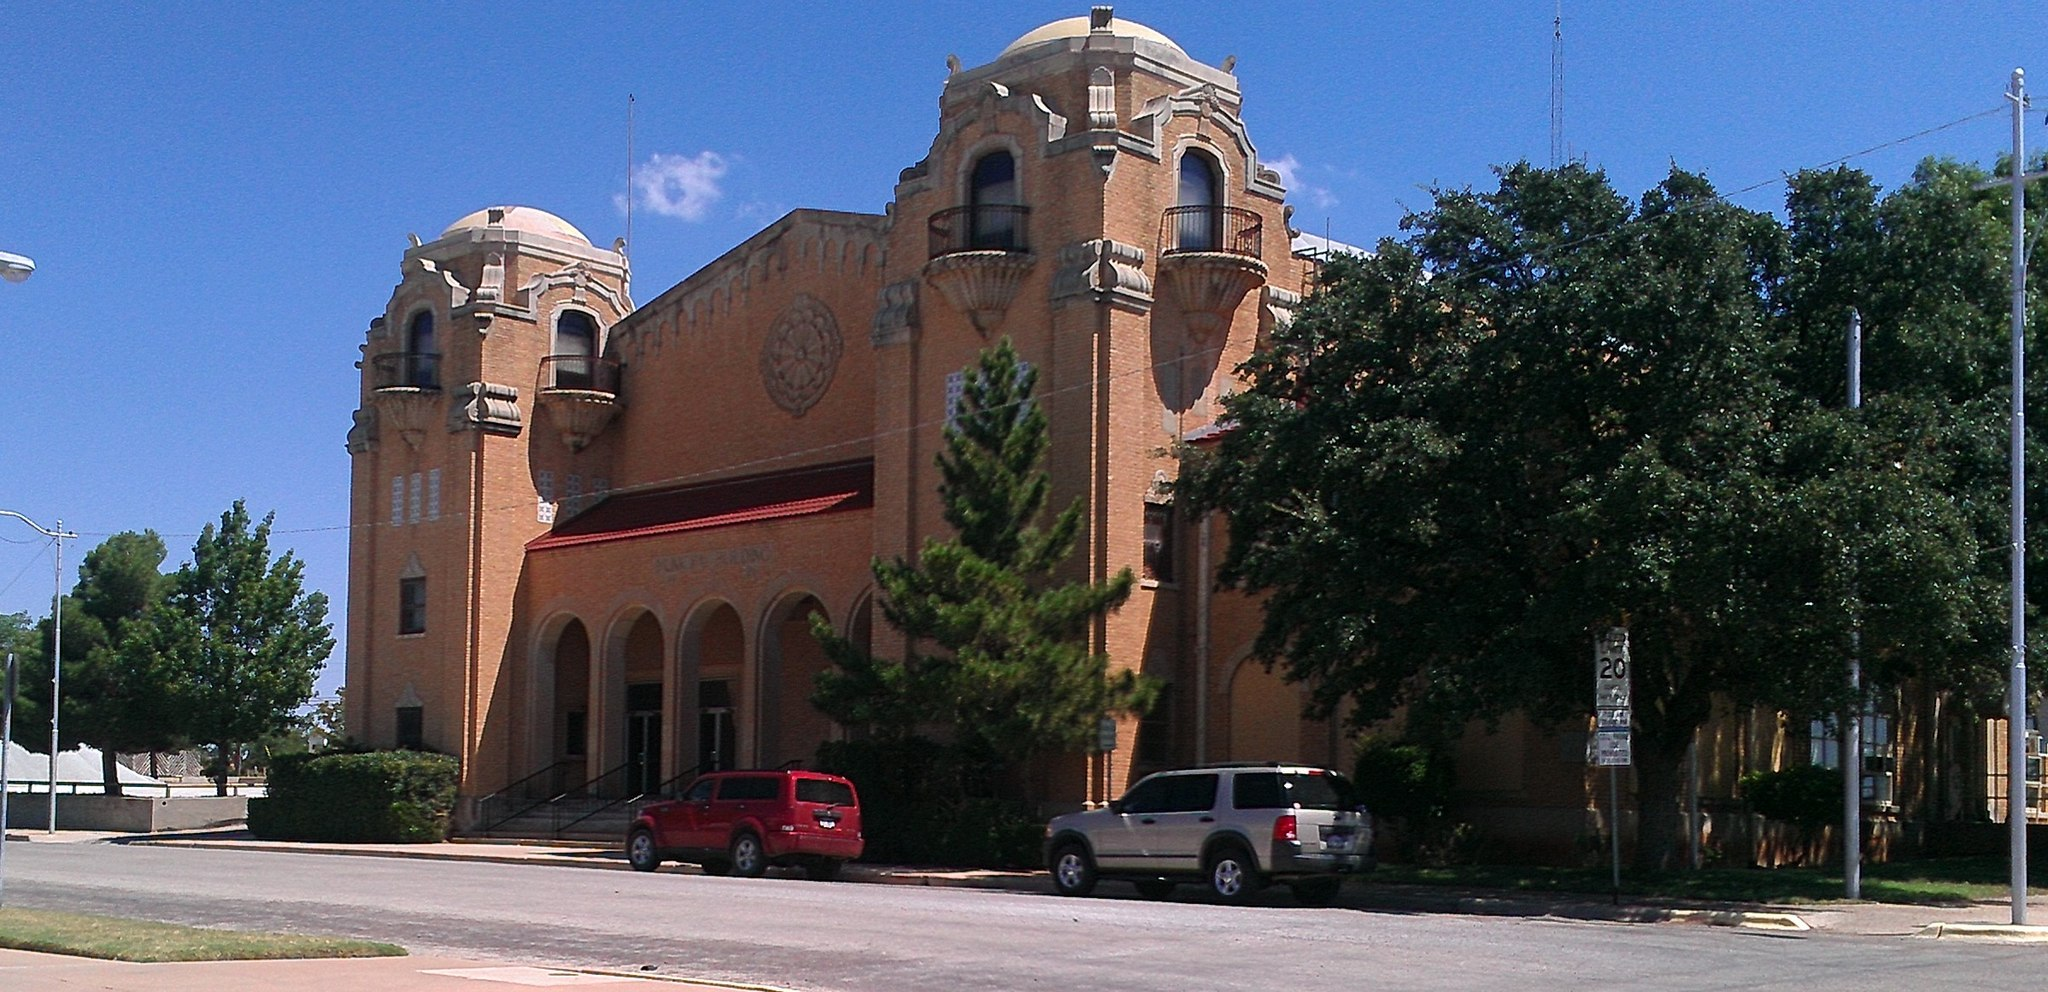 Sweetwateri linn Texases. Pildistas CletusDitto (GFDL www.gnu.org või CC BY-SA 3.0 creativecommons.org), via Wikimedia Commons.jpg